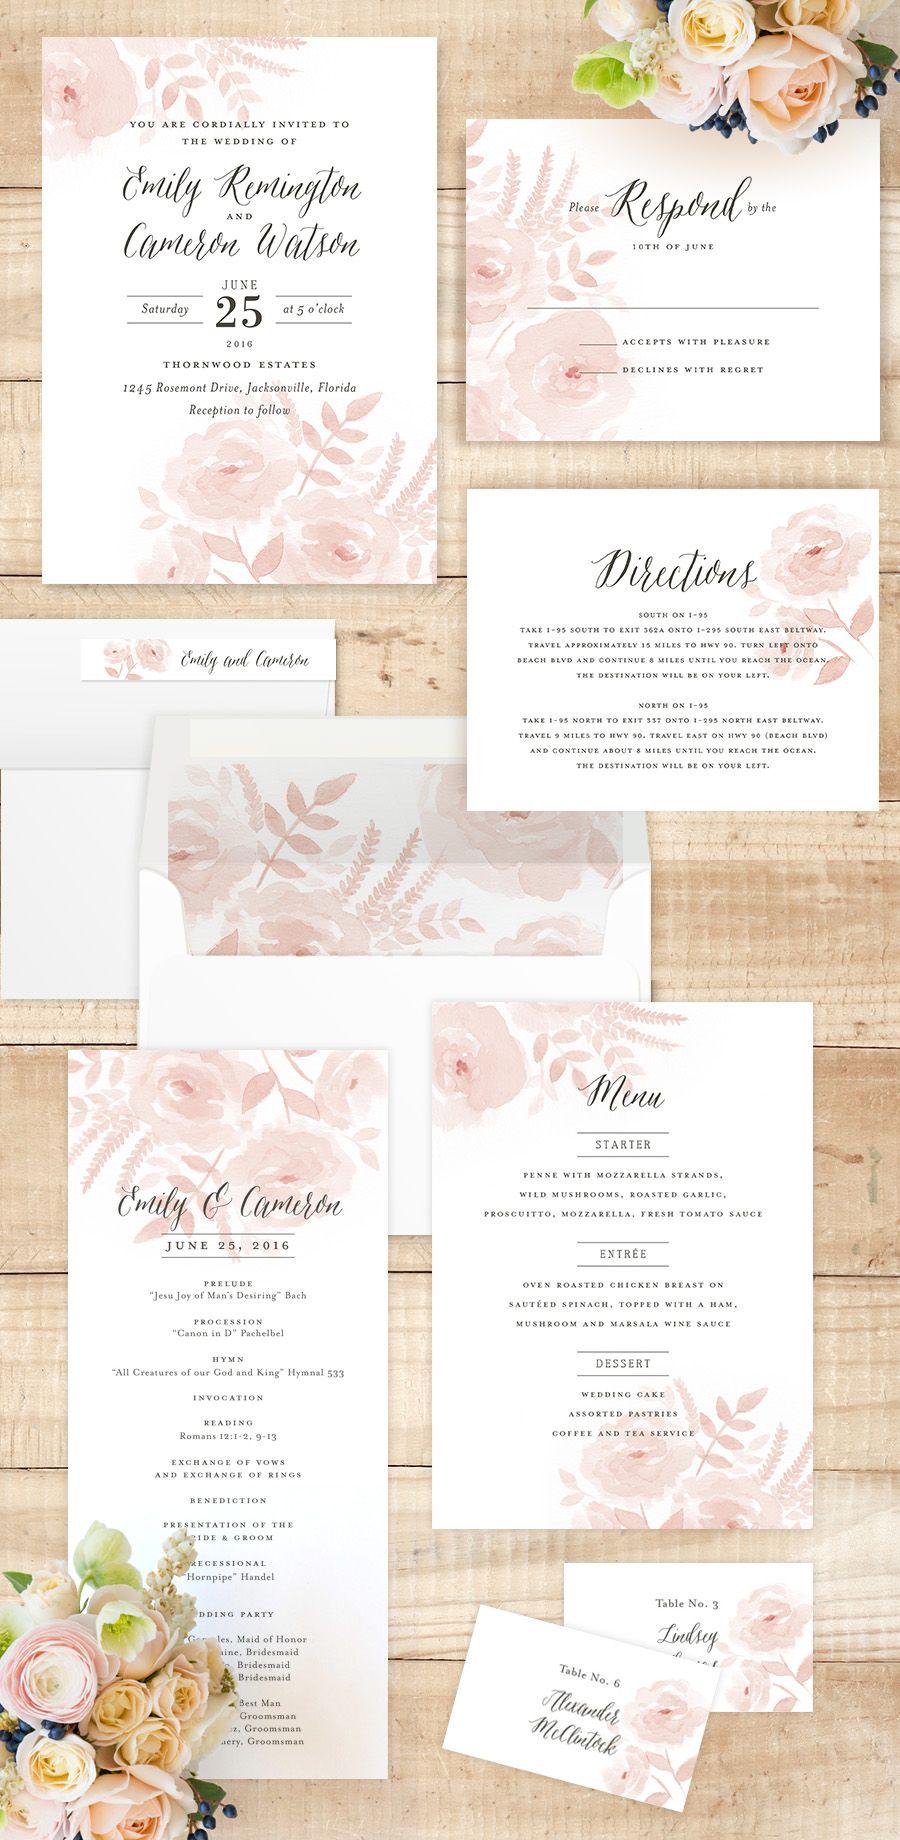 20 popular wedding invitation wording diy templates ideas delicate watercolor wedding florals invitations for a spring or summer garden wedding by jill means stopboris Images